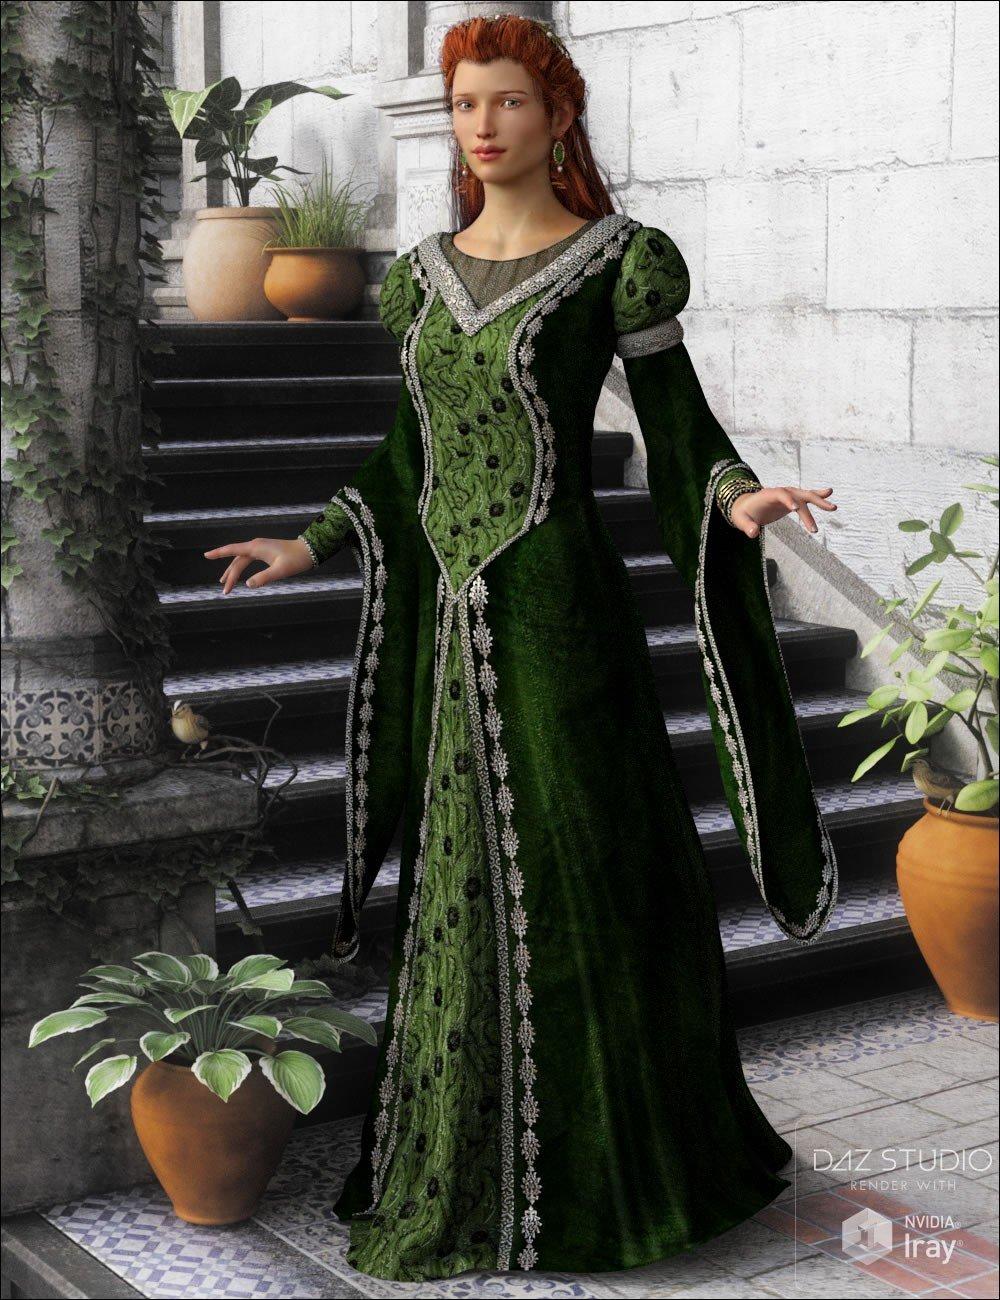 Medieval Royalty_DAZ3D下载站